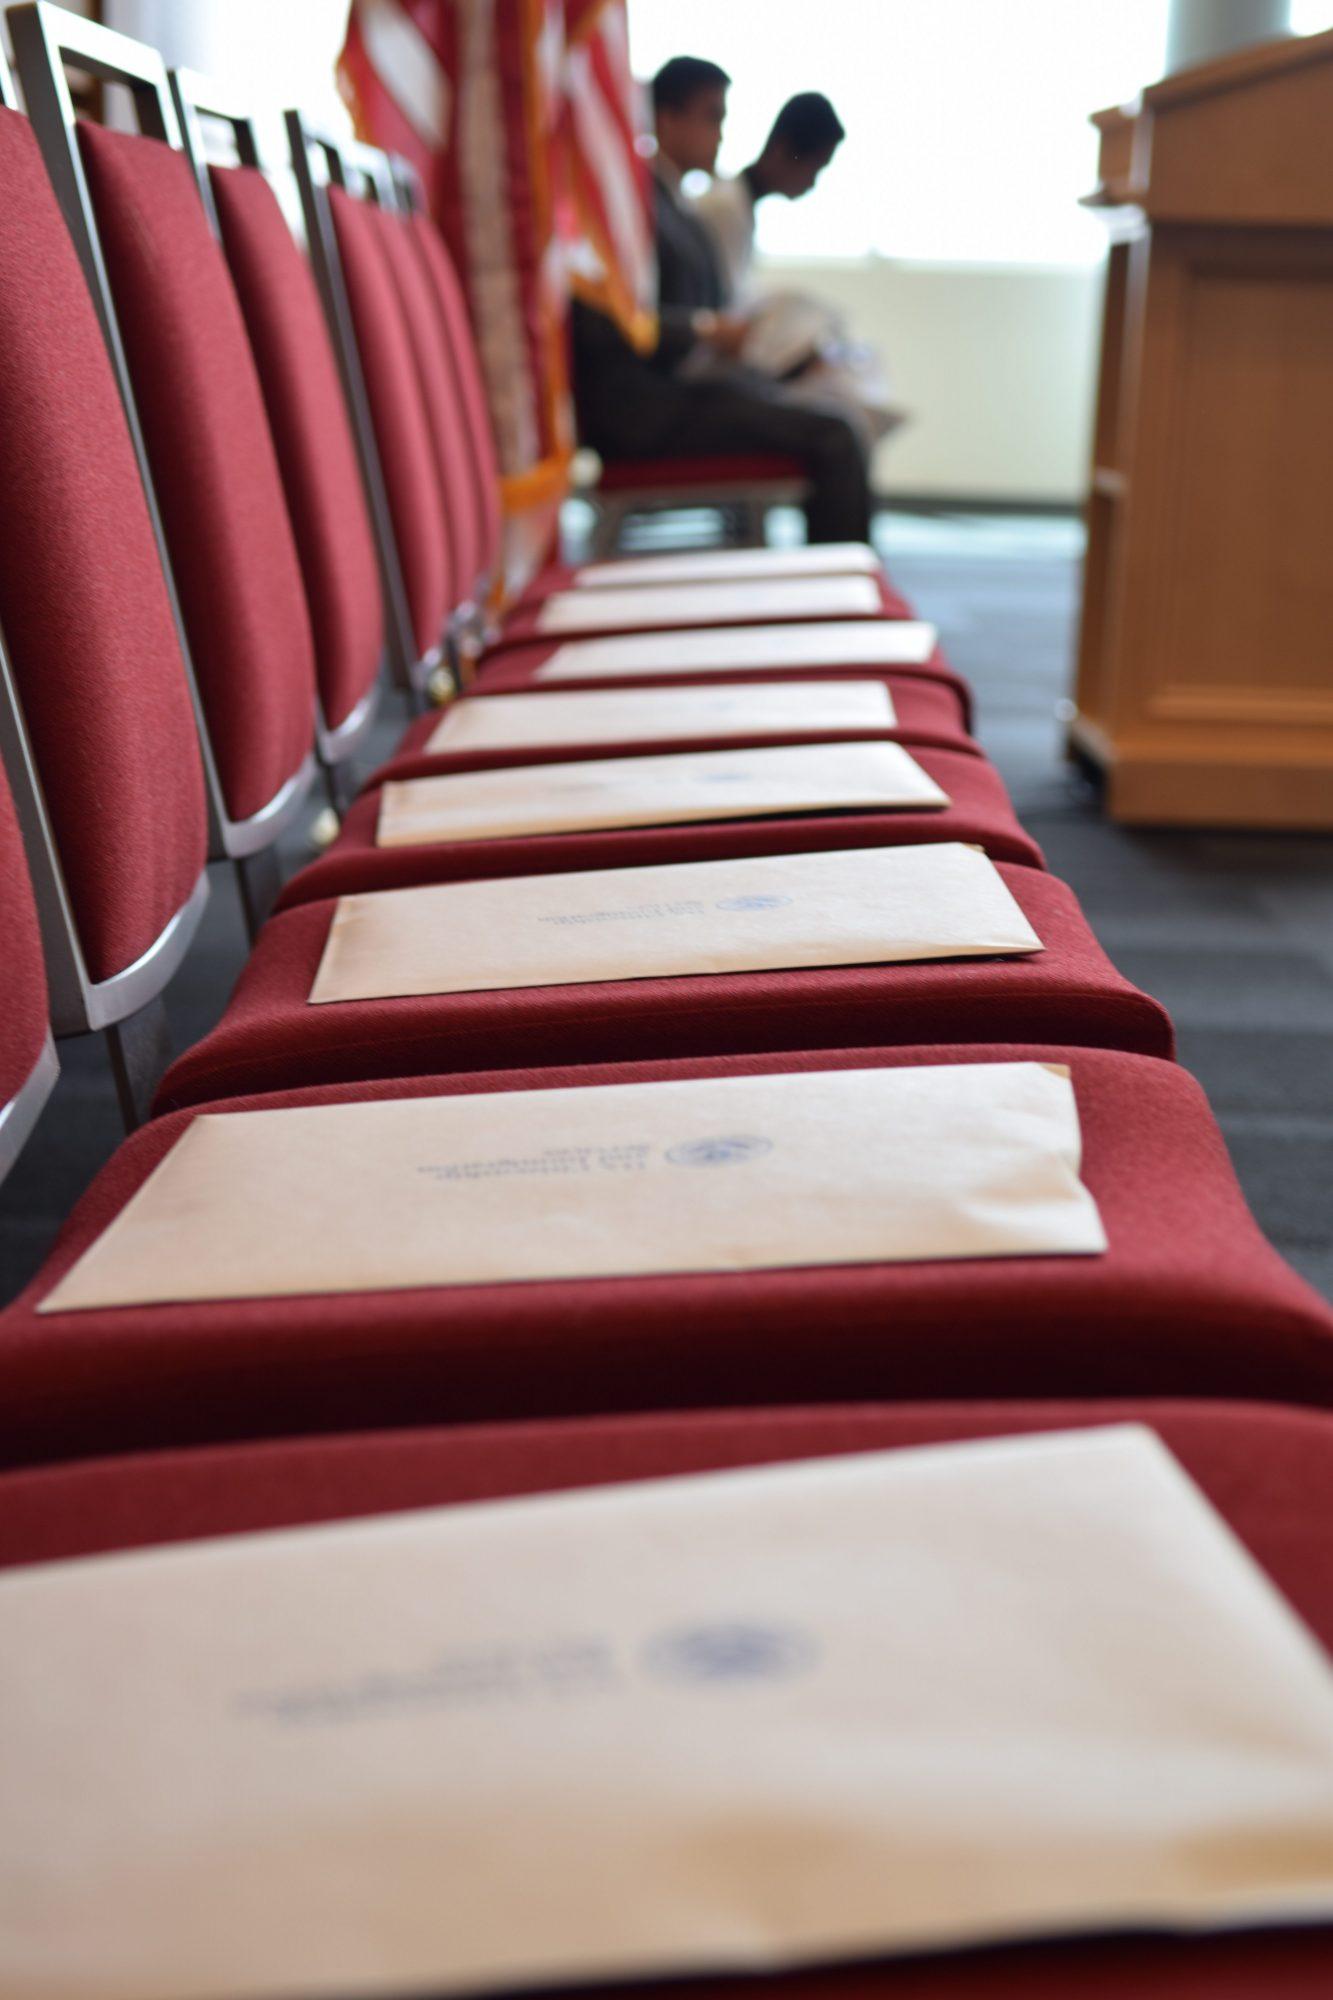 Eccles School helps welcome new U.S. citizens in ceremony